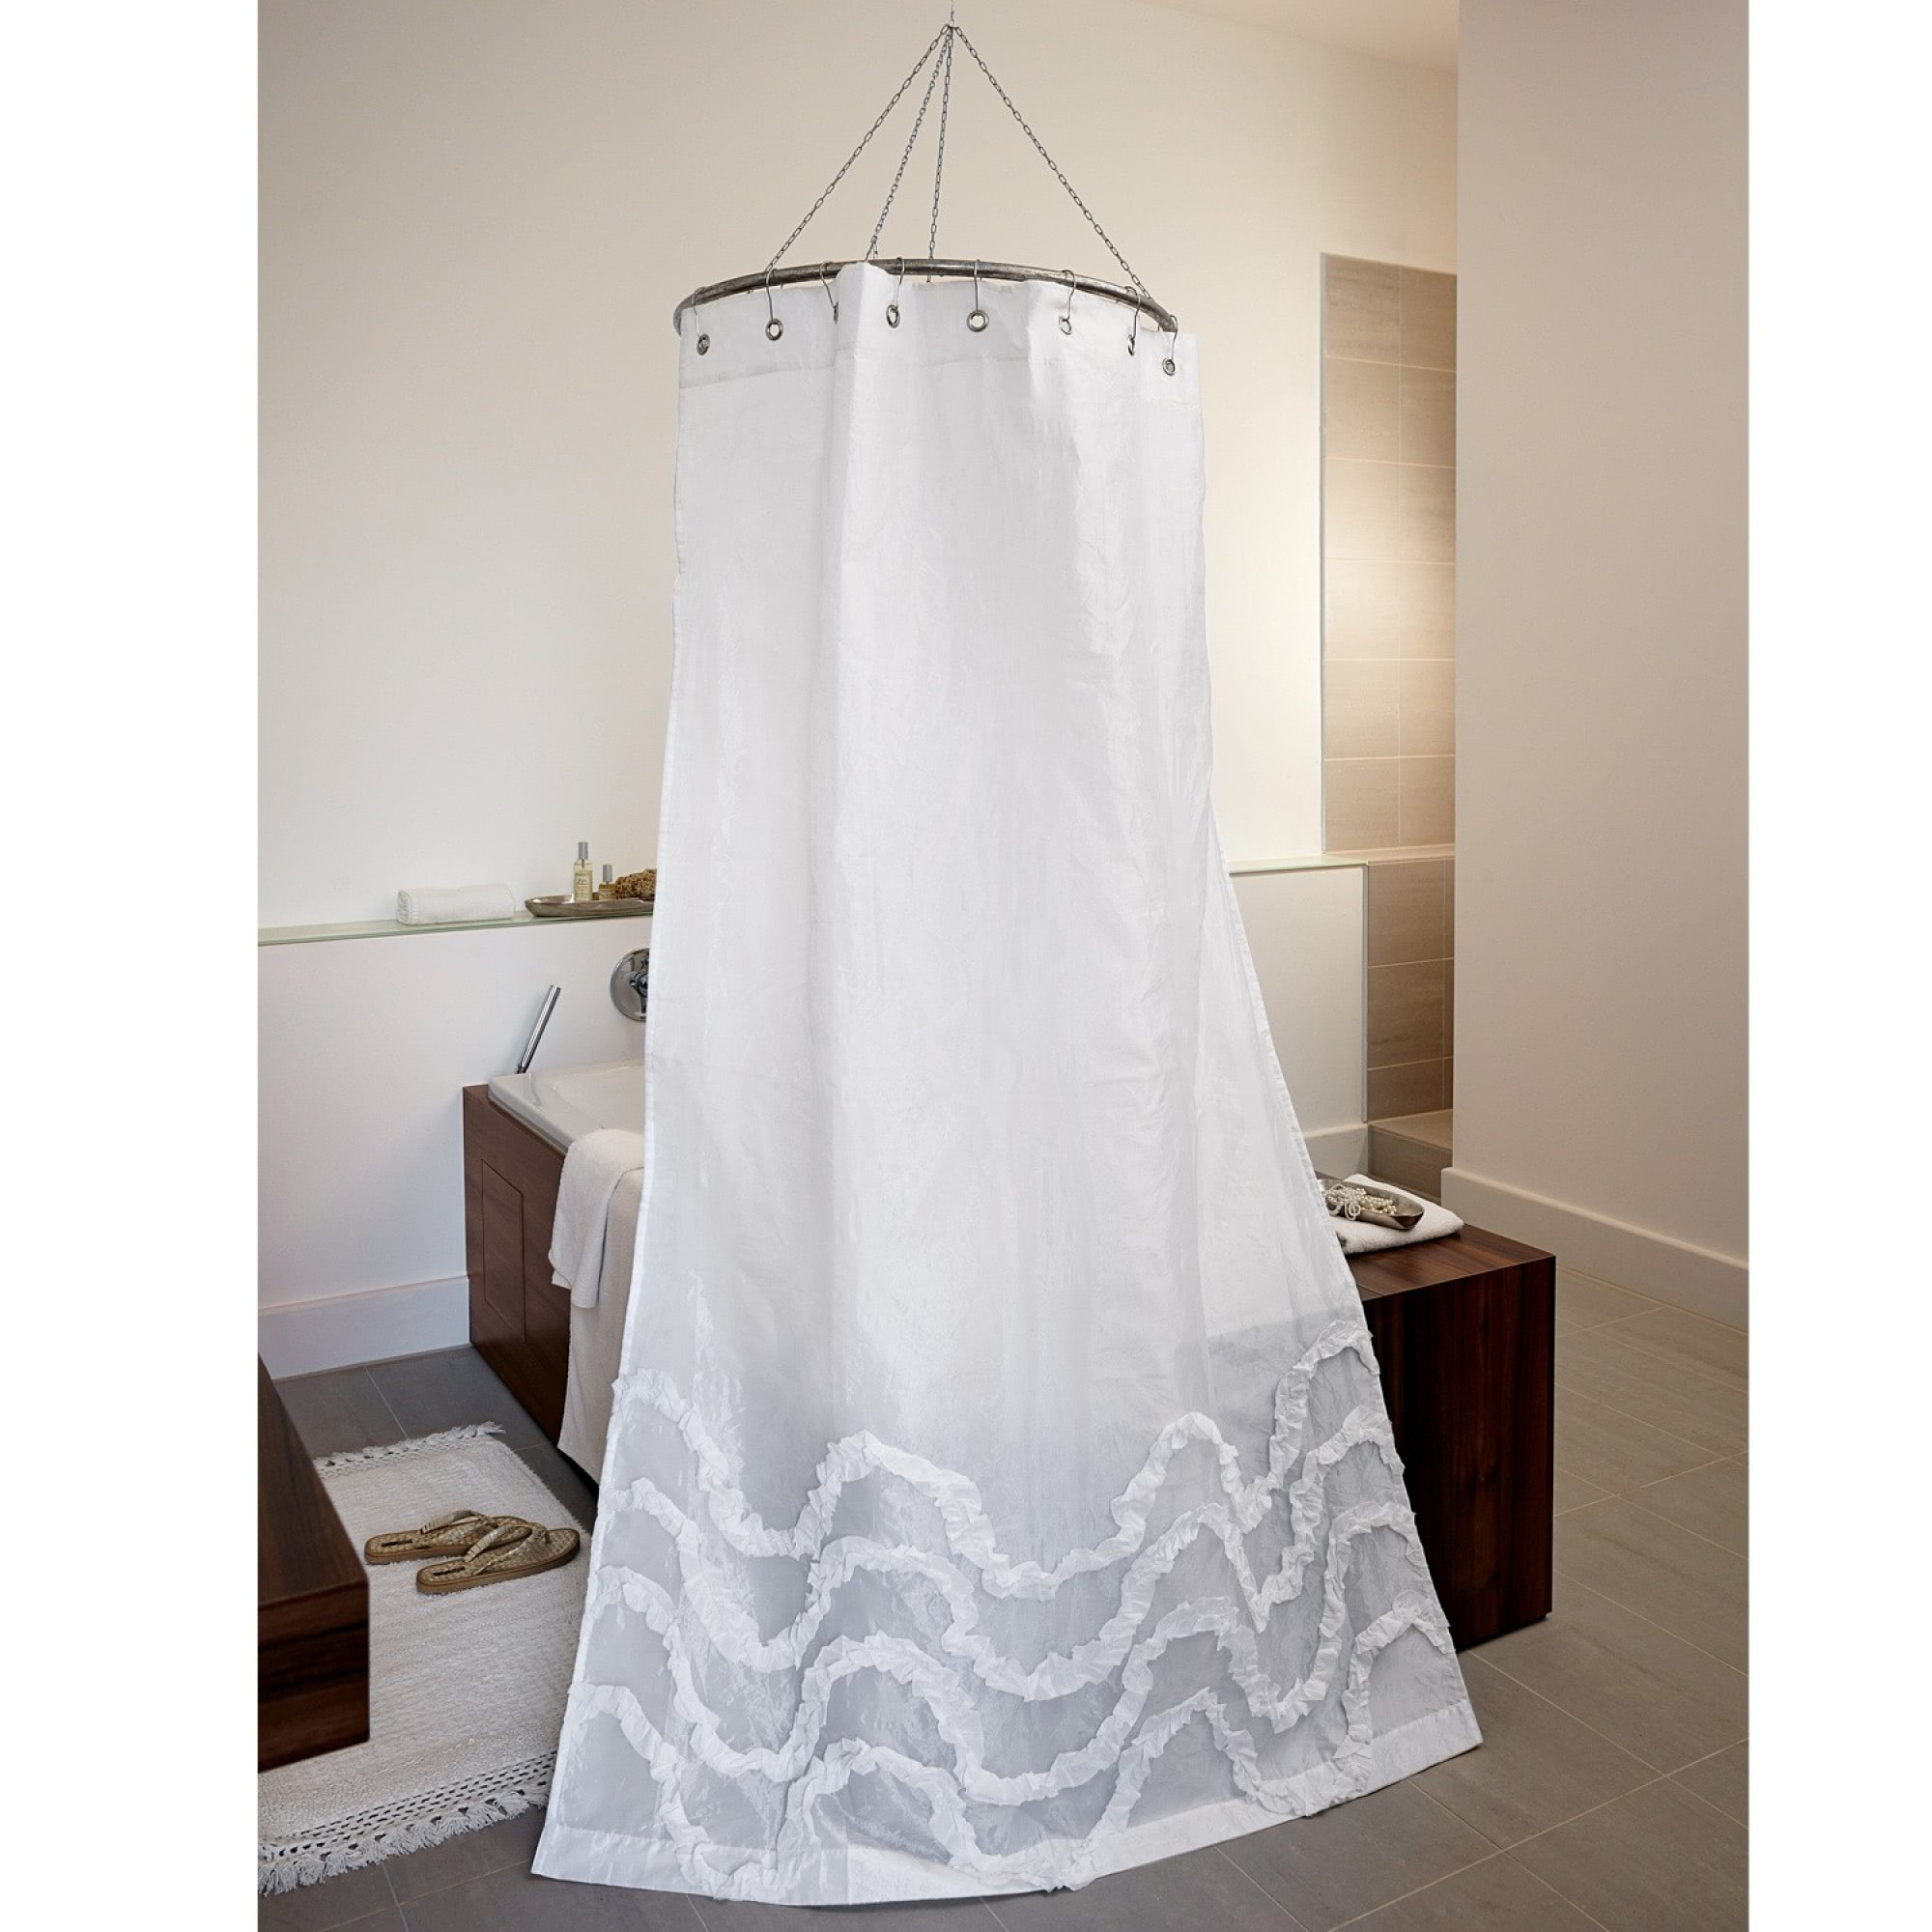 duschvorhang plumont loberon coming home. Black Bedroom Furniture Sets. Home Design Ideas